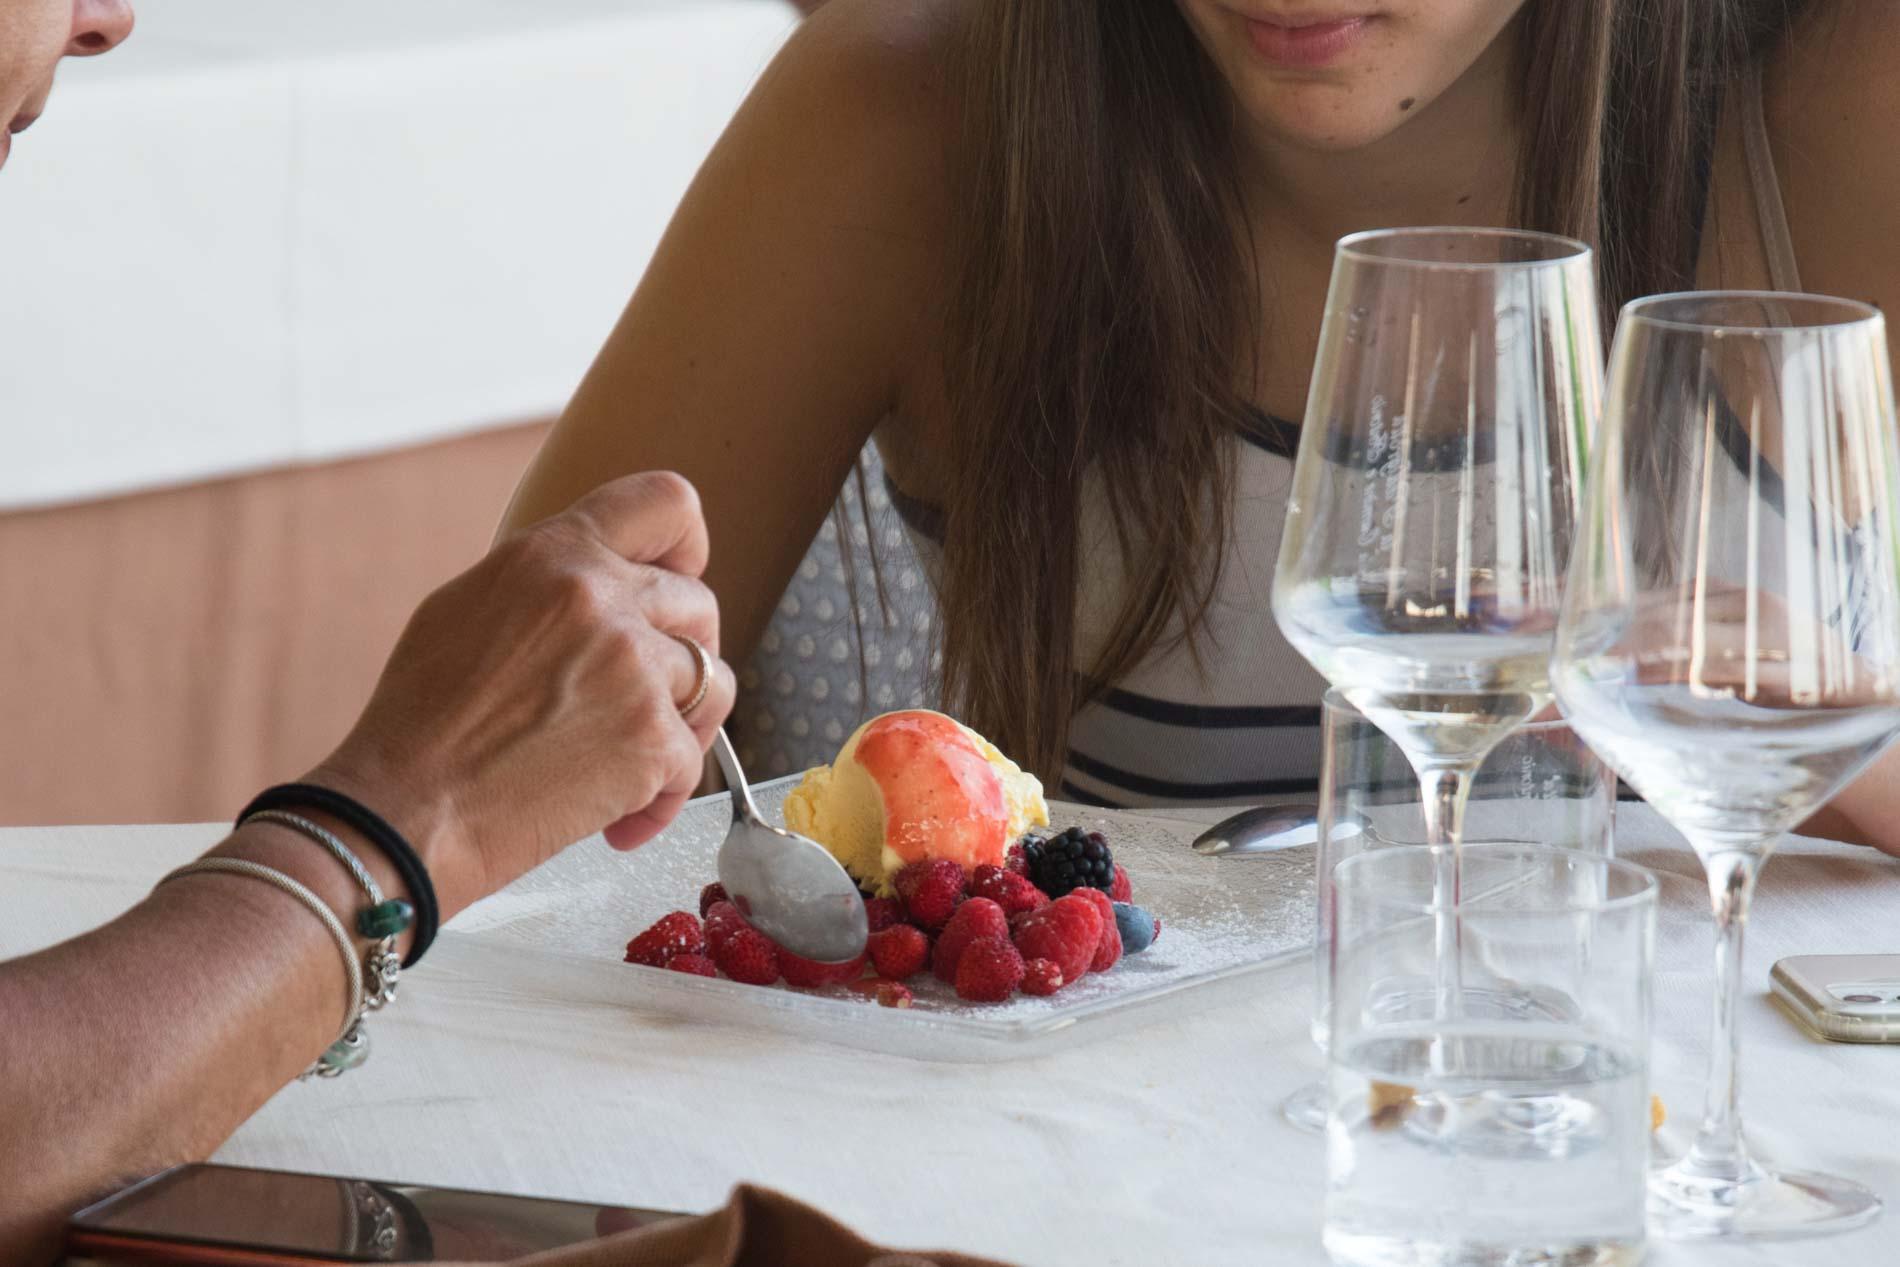 la-piedigrotta-ristorante-da-carmine-e-antonio-166